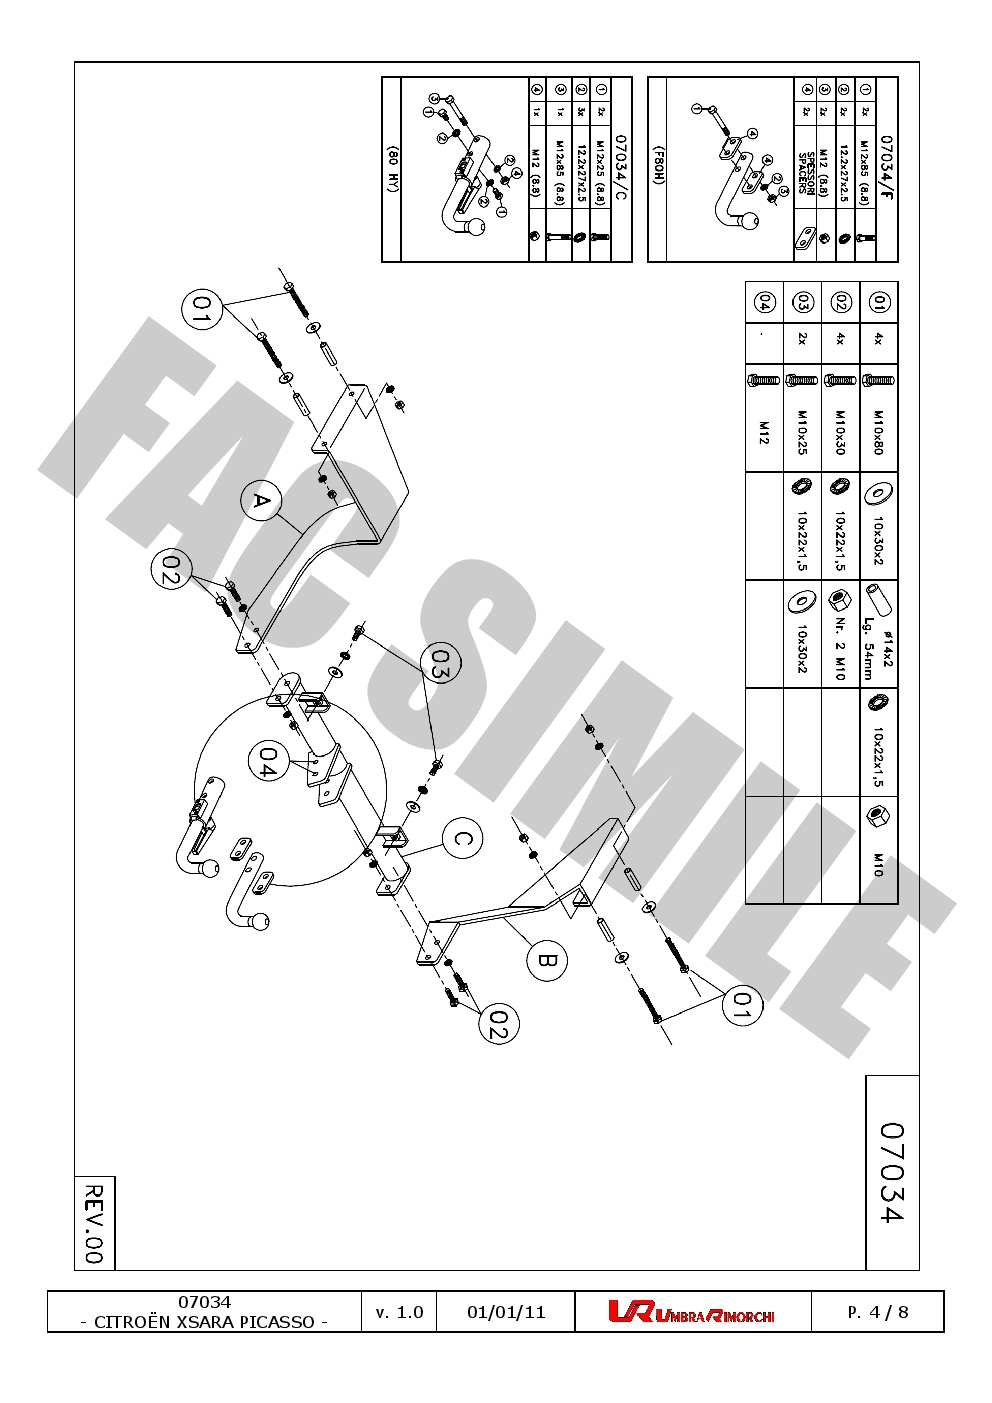 Citroen Xsara 1999 Wiring Diagram | Wiring Diagram on junction box diagram, wiring box diagram, light box diagram, fuel tank sending unit diagram, fuel pump diagram, meter box diagram, fuse wire, oxygen box diagram, 2002 sebring box diagram, engine diagram, element box diagram, relay diagram, roof diagram, power box diagram, circuit breaker diagram, fuse line diagram, control box diagram, gear box diagram, fuse tv, heater box diagram,